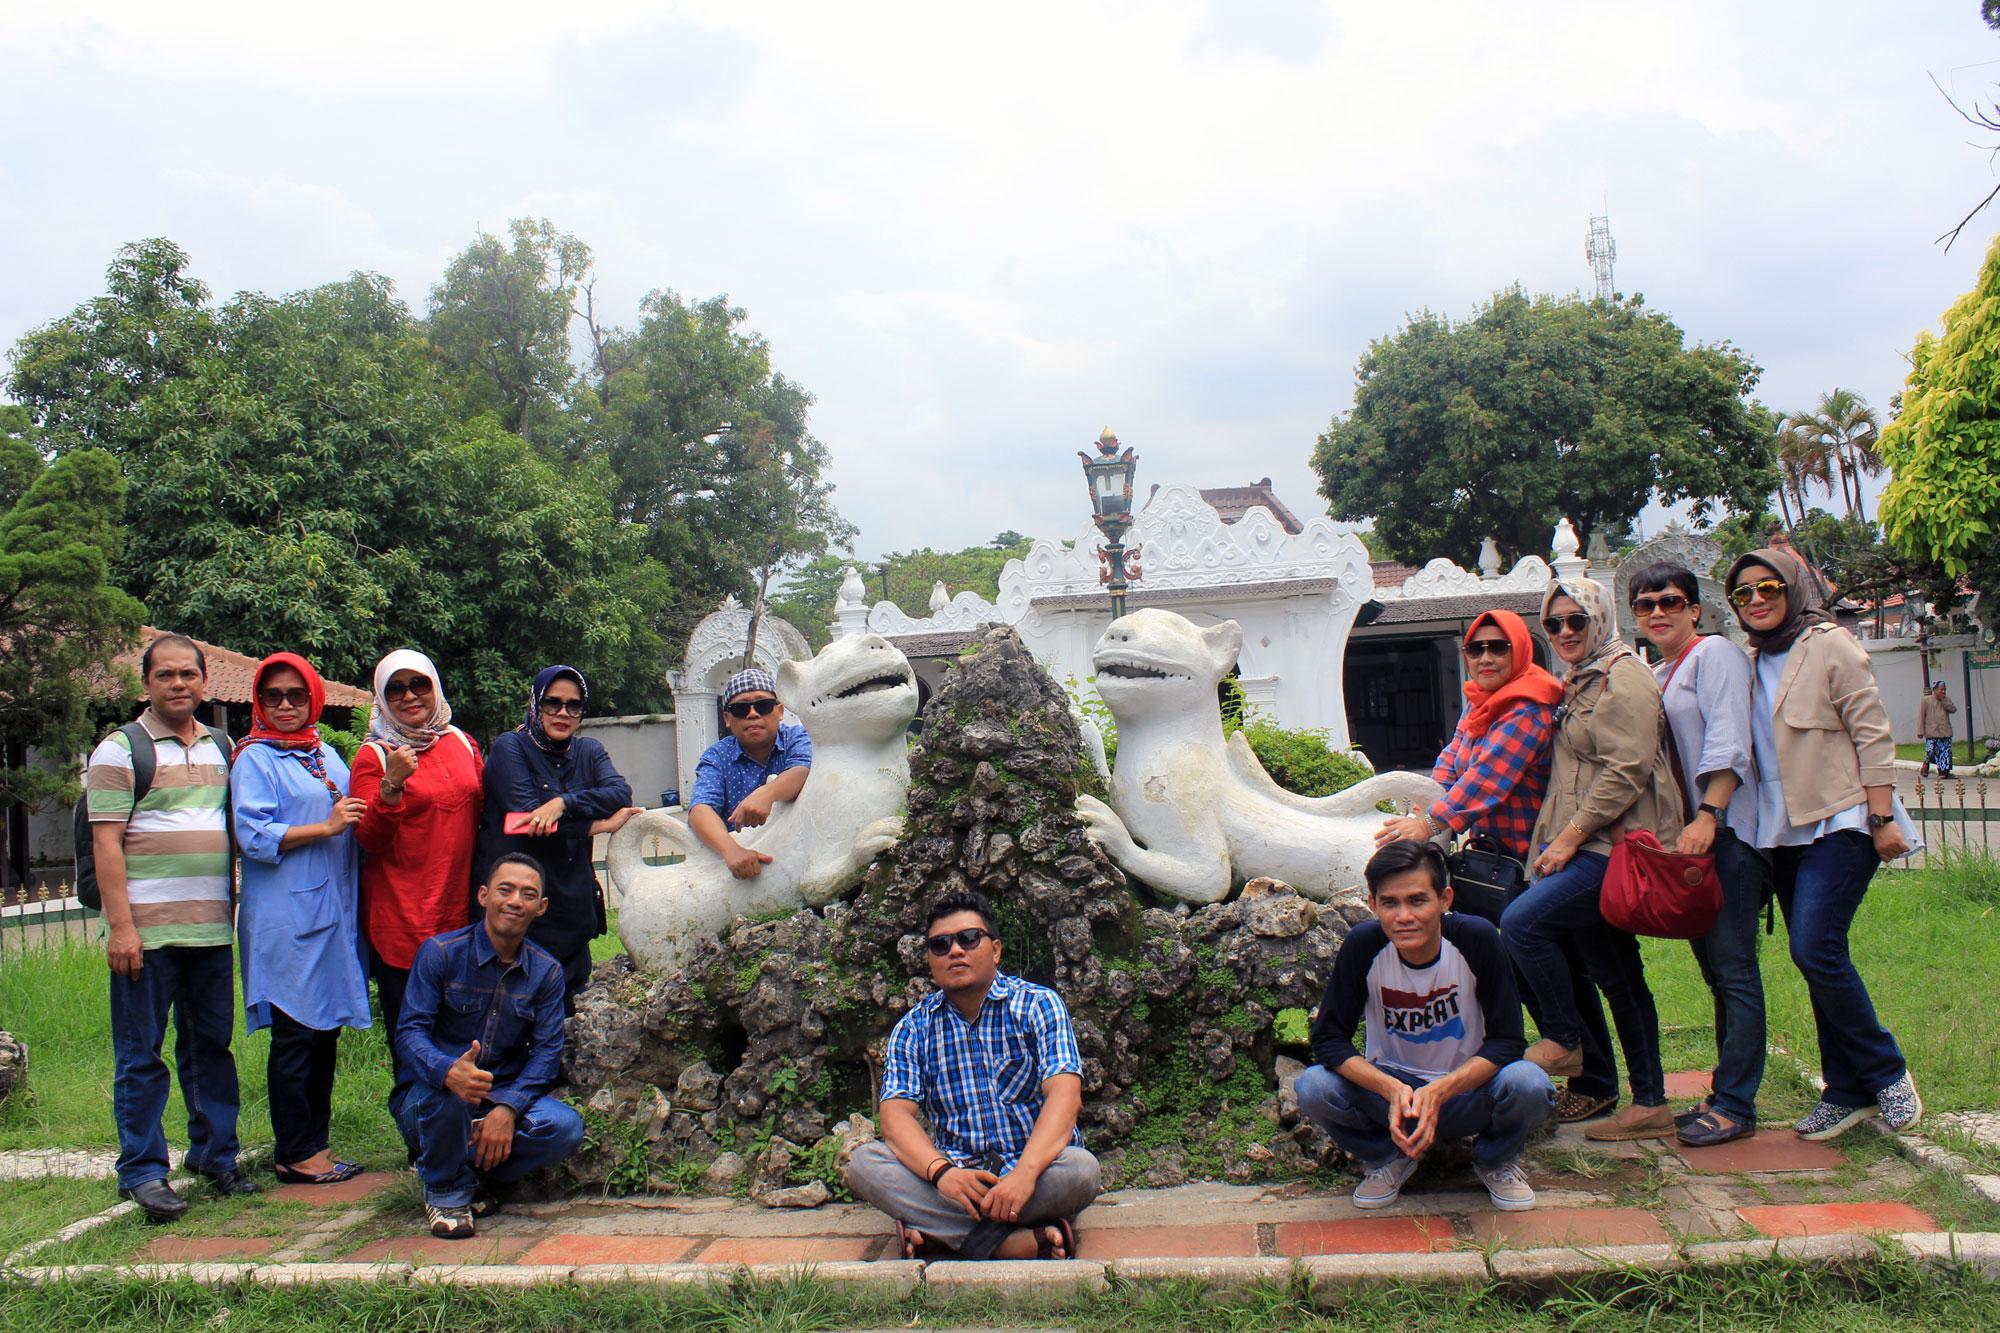 3 Tujuan Wisata Terpopuler di Cirebon